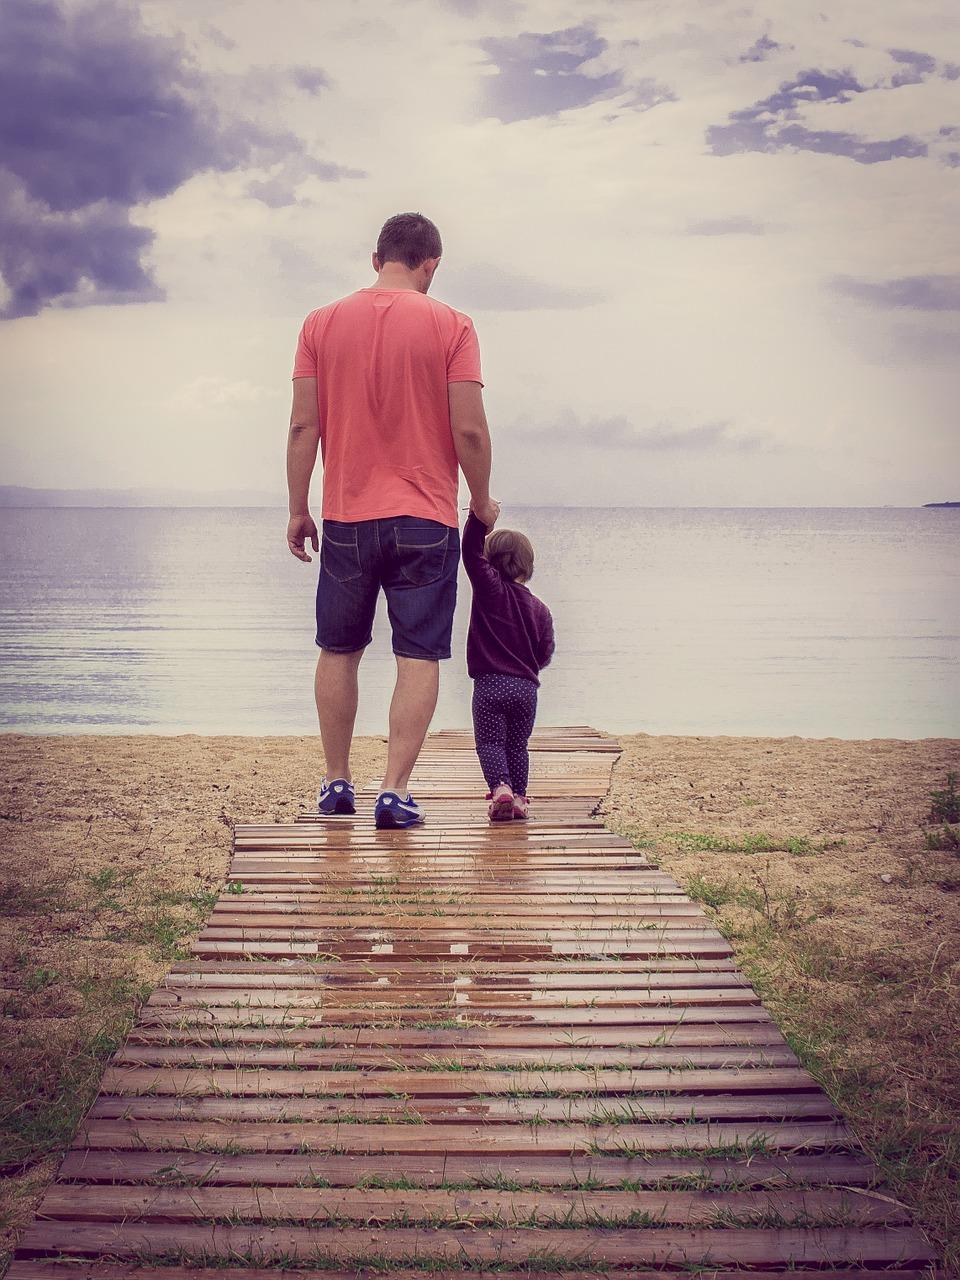 https://adwokatkuligowska.pl/wp-content/uploads/2019/07/fathers-day-822550_1280.jpg